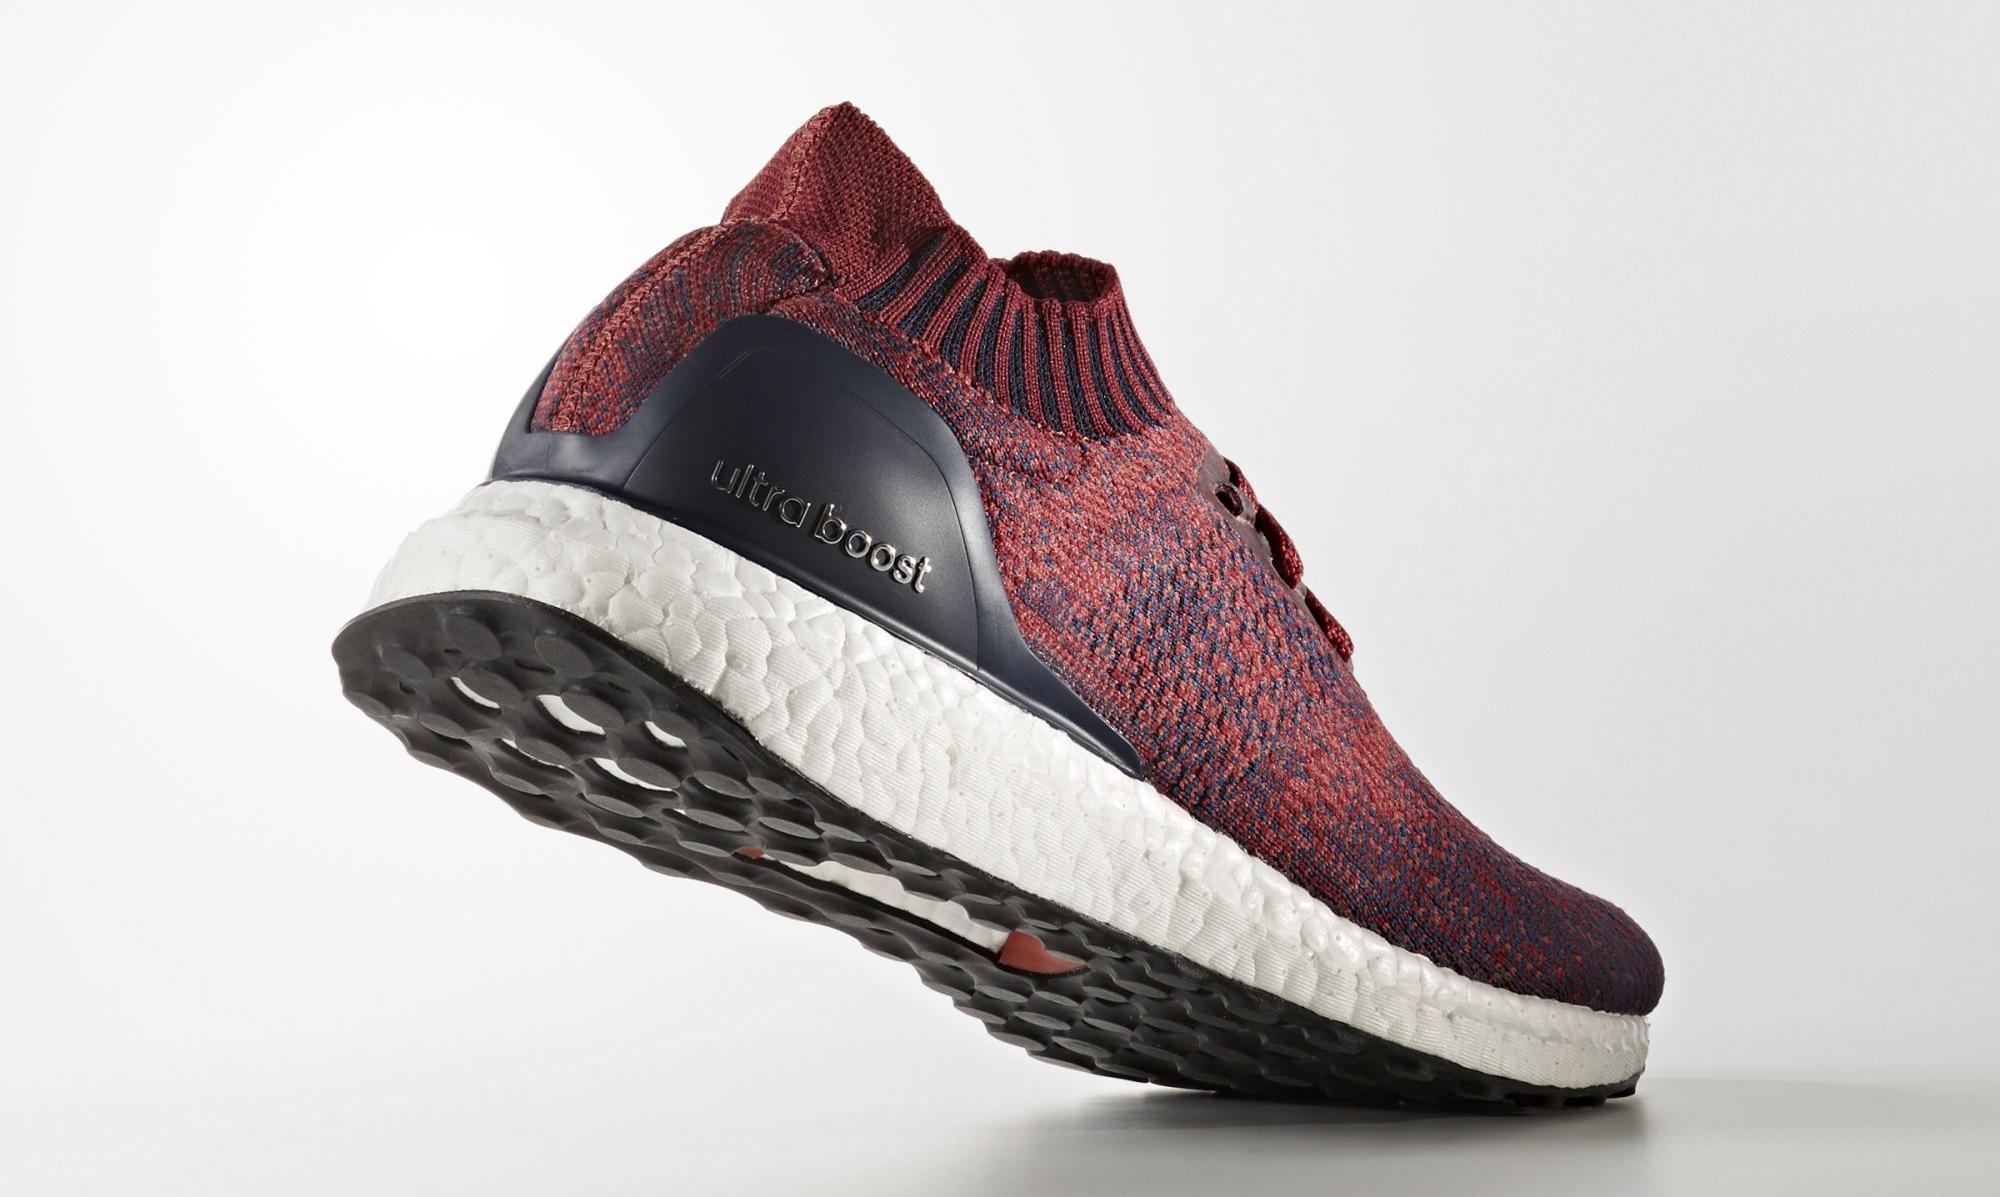 adidas-ultra-boost-uncaged-burgundy3